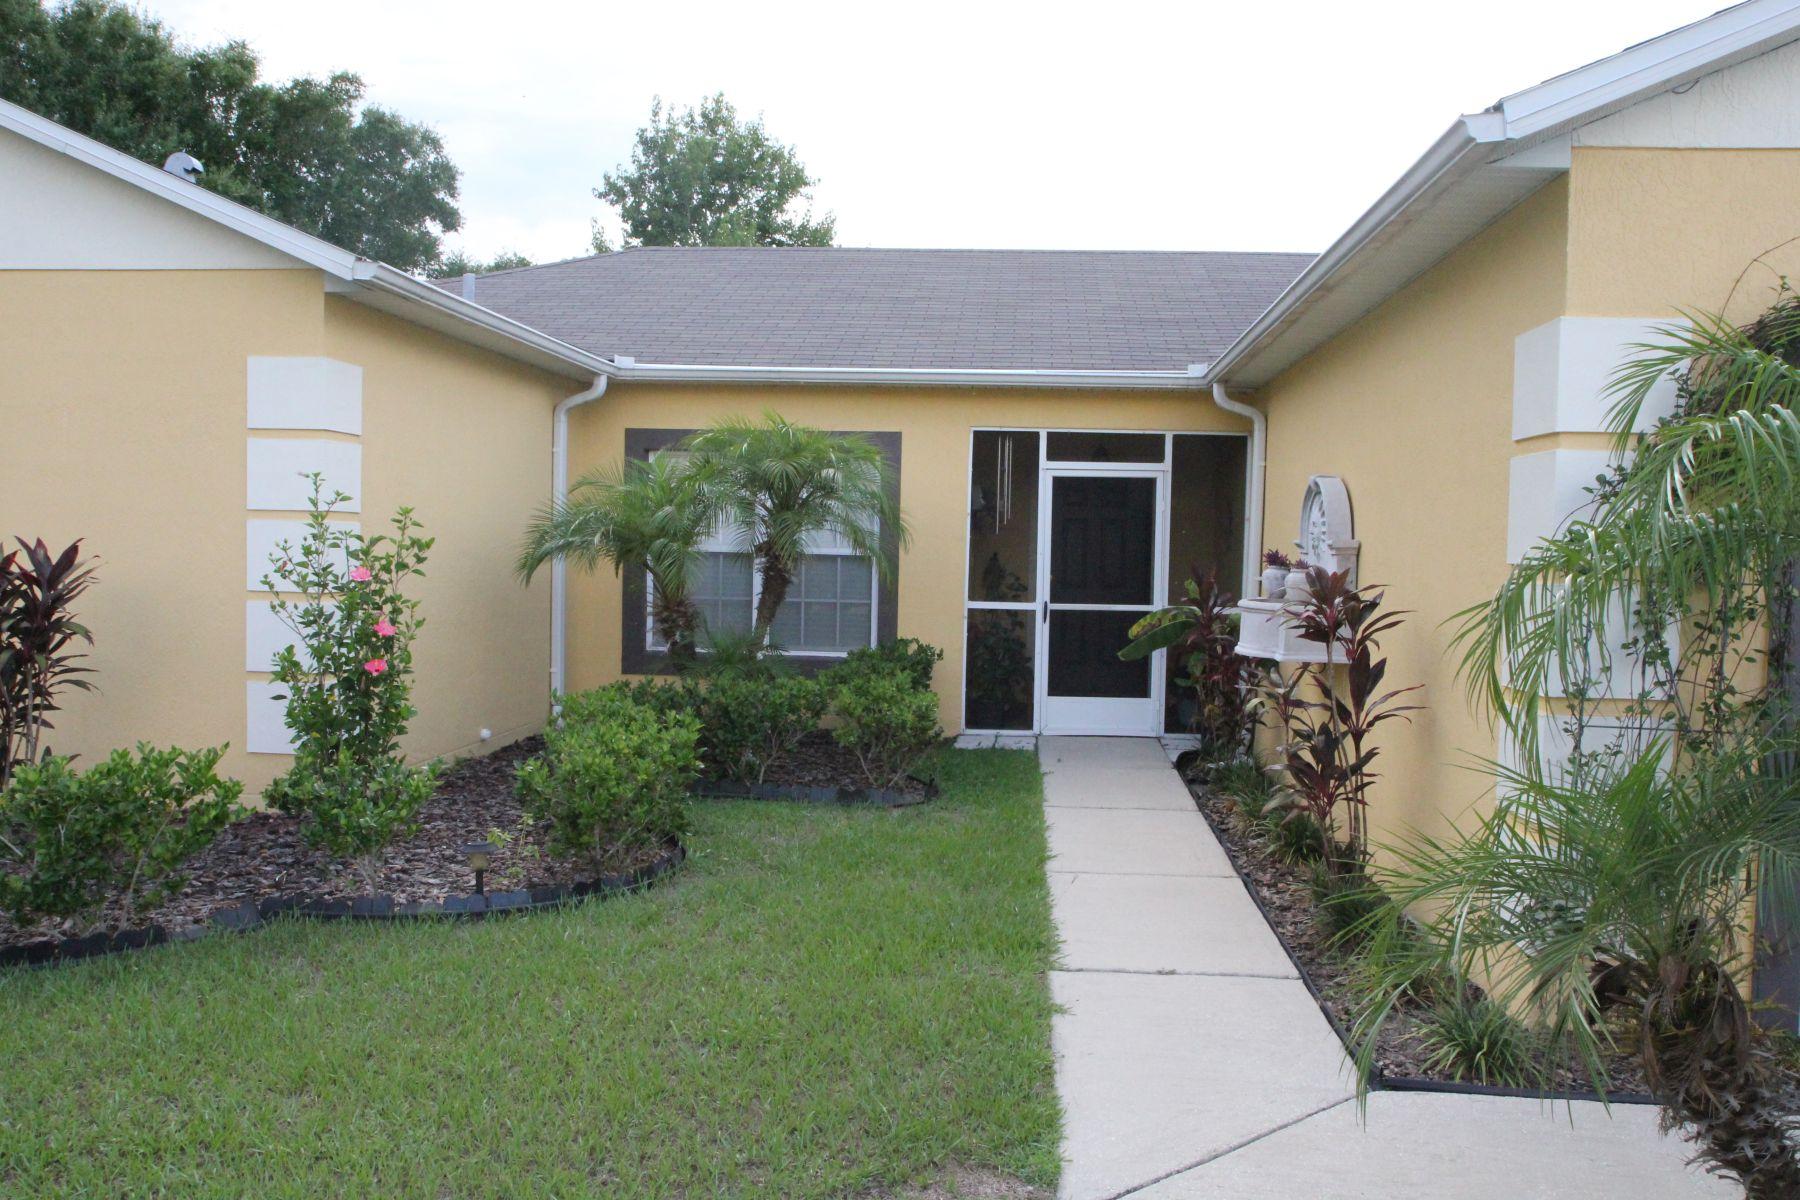 Casa Unifamiliar por un Venta en Kissimmee, Florida 503 Carlsbad Dr Kissimmee, Florida 34758 Estados Unidos